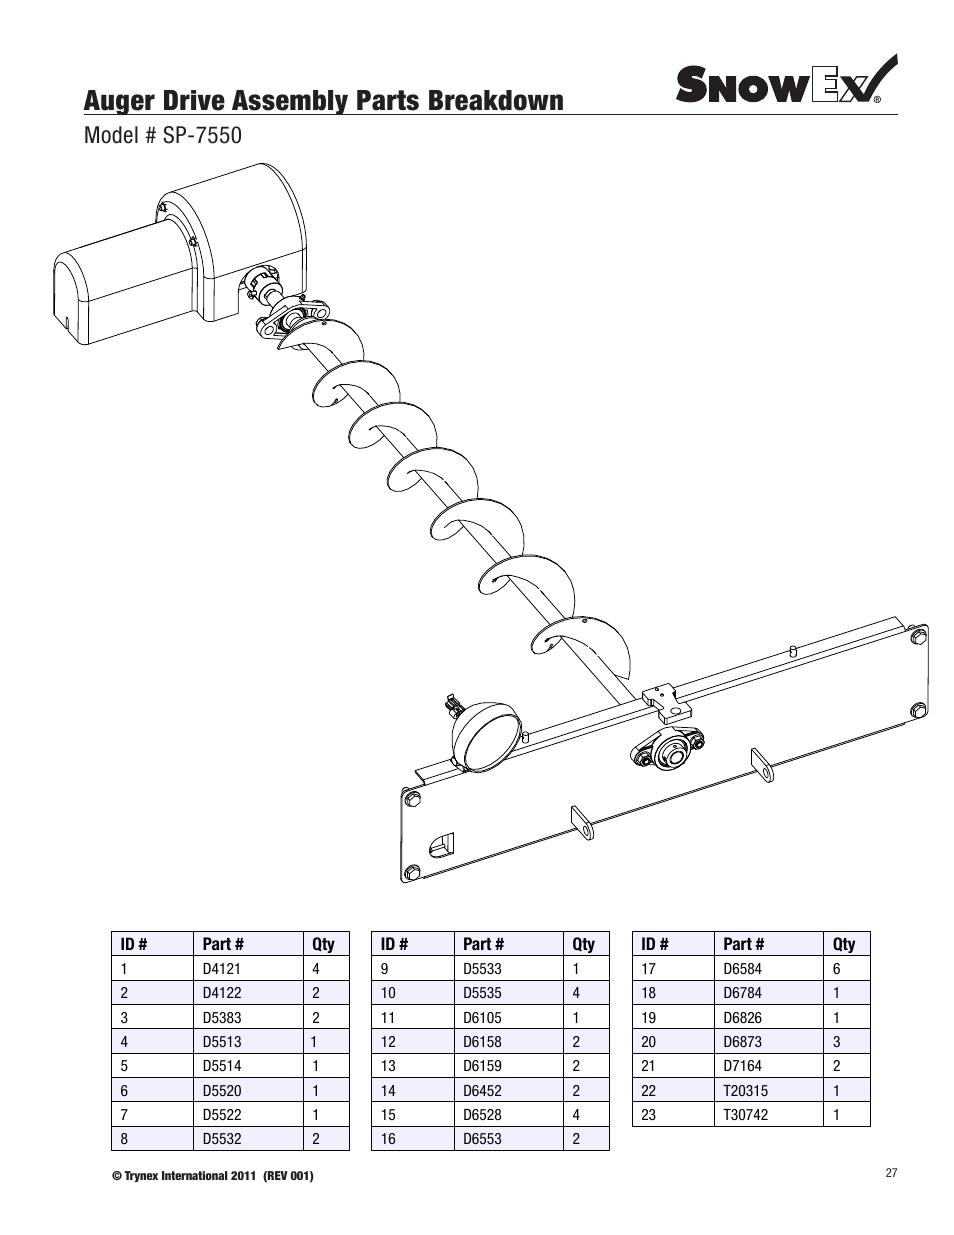 Auger drive assembly parts breakdown, Model # sp-7550